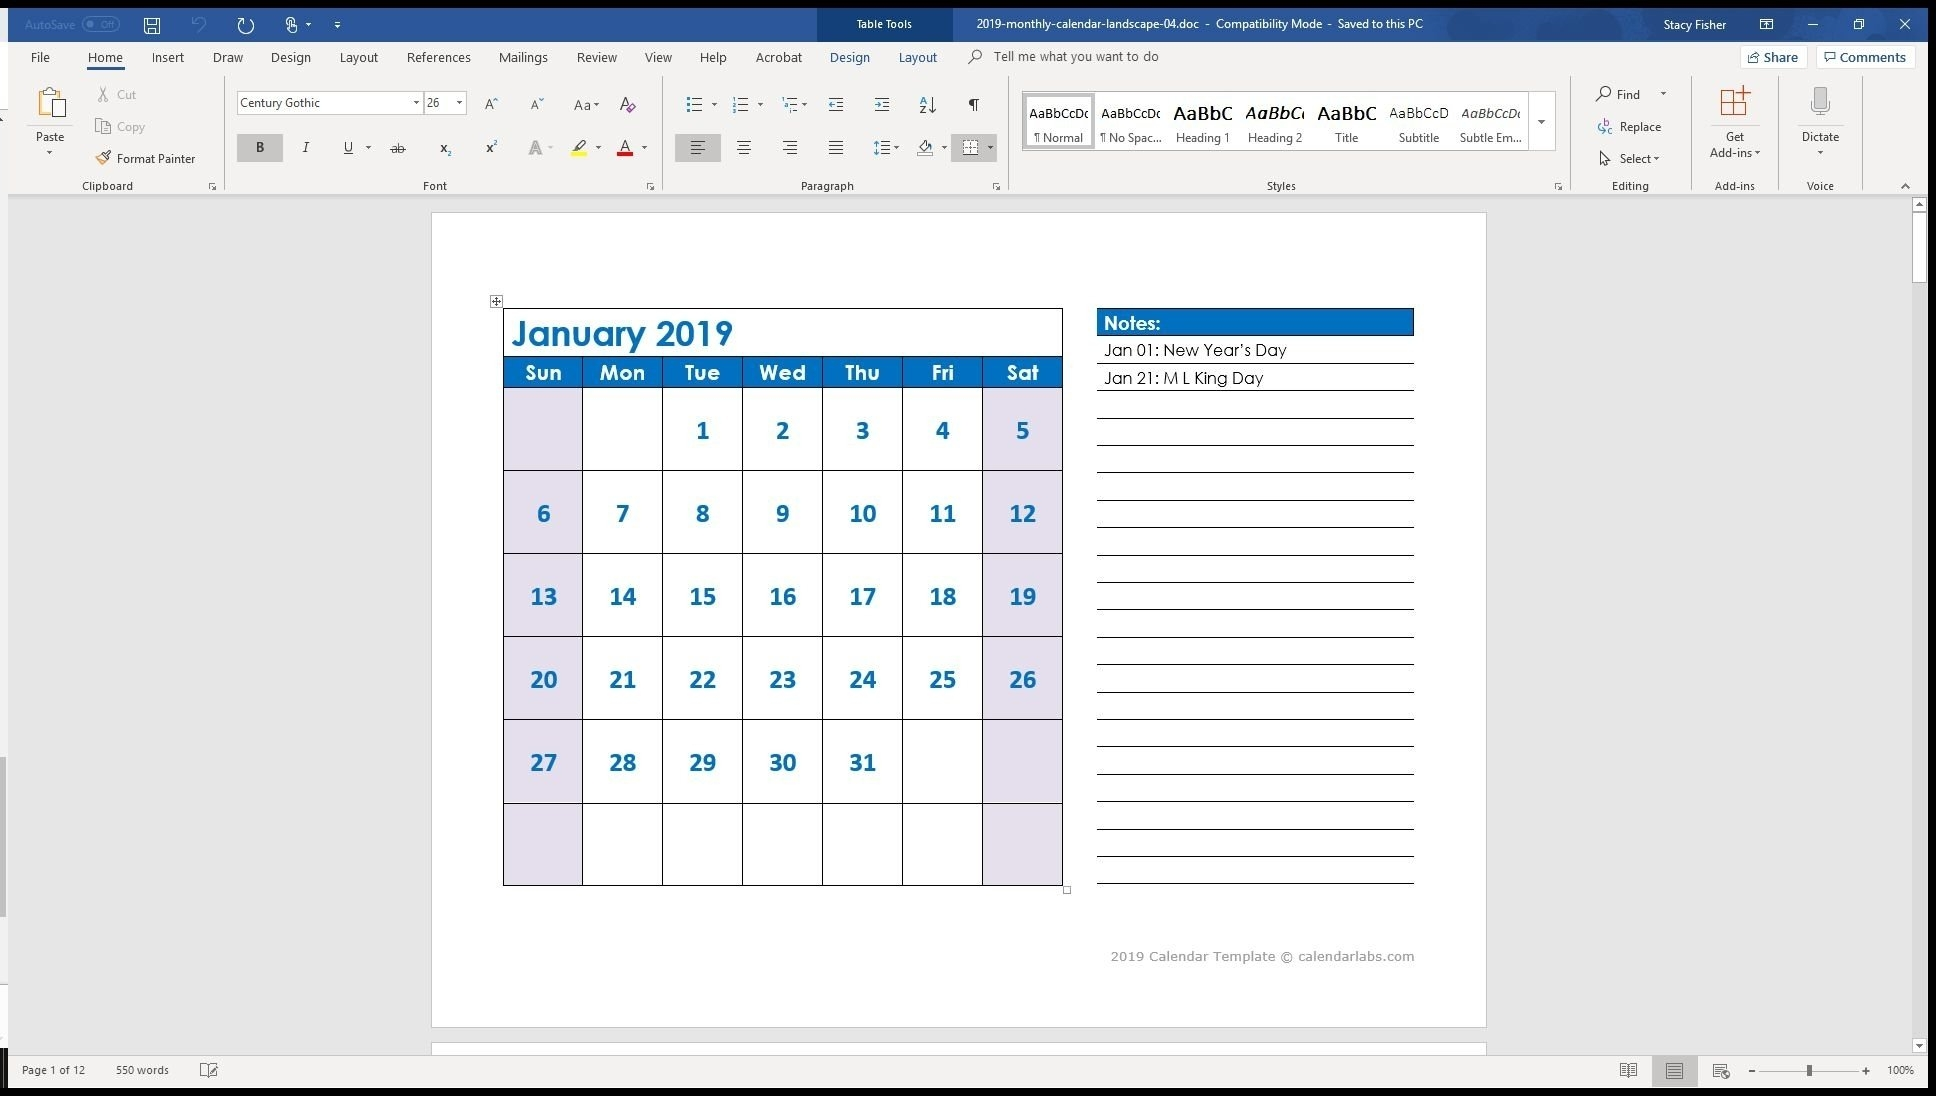 Printable Calendar With Lines | Ten Free Printable Calendar 2020-2021 for Calendar With Lines And Times 2021 Image